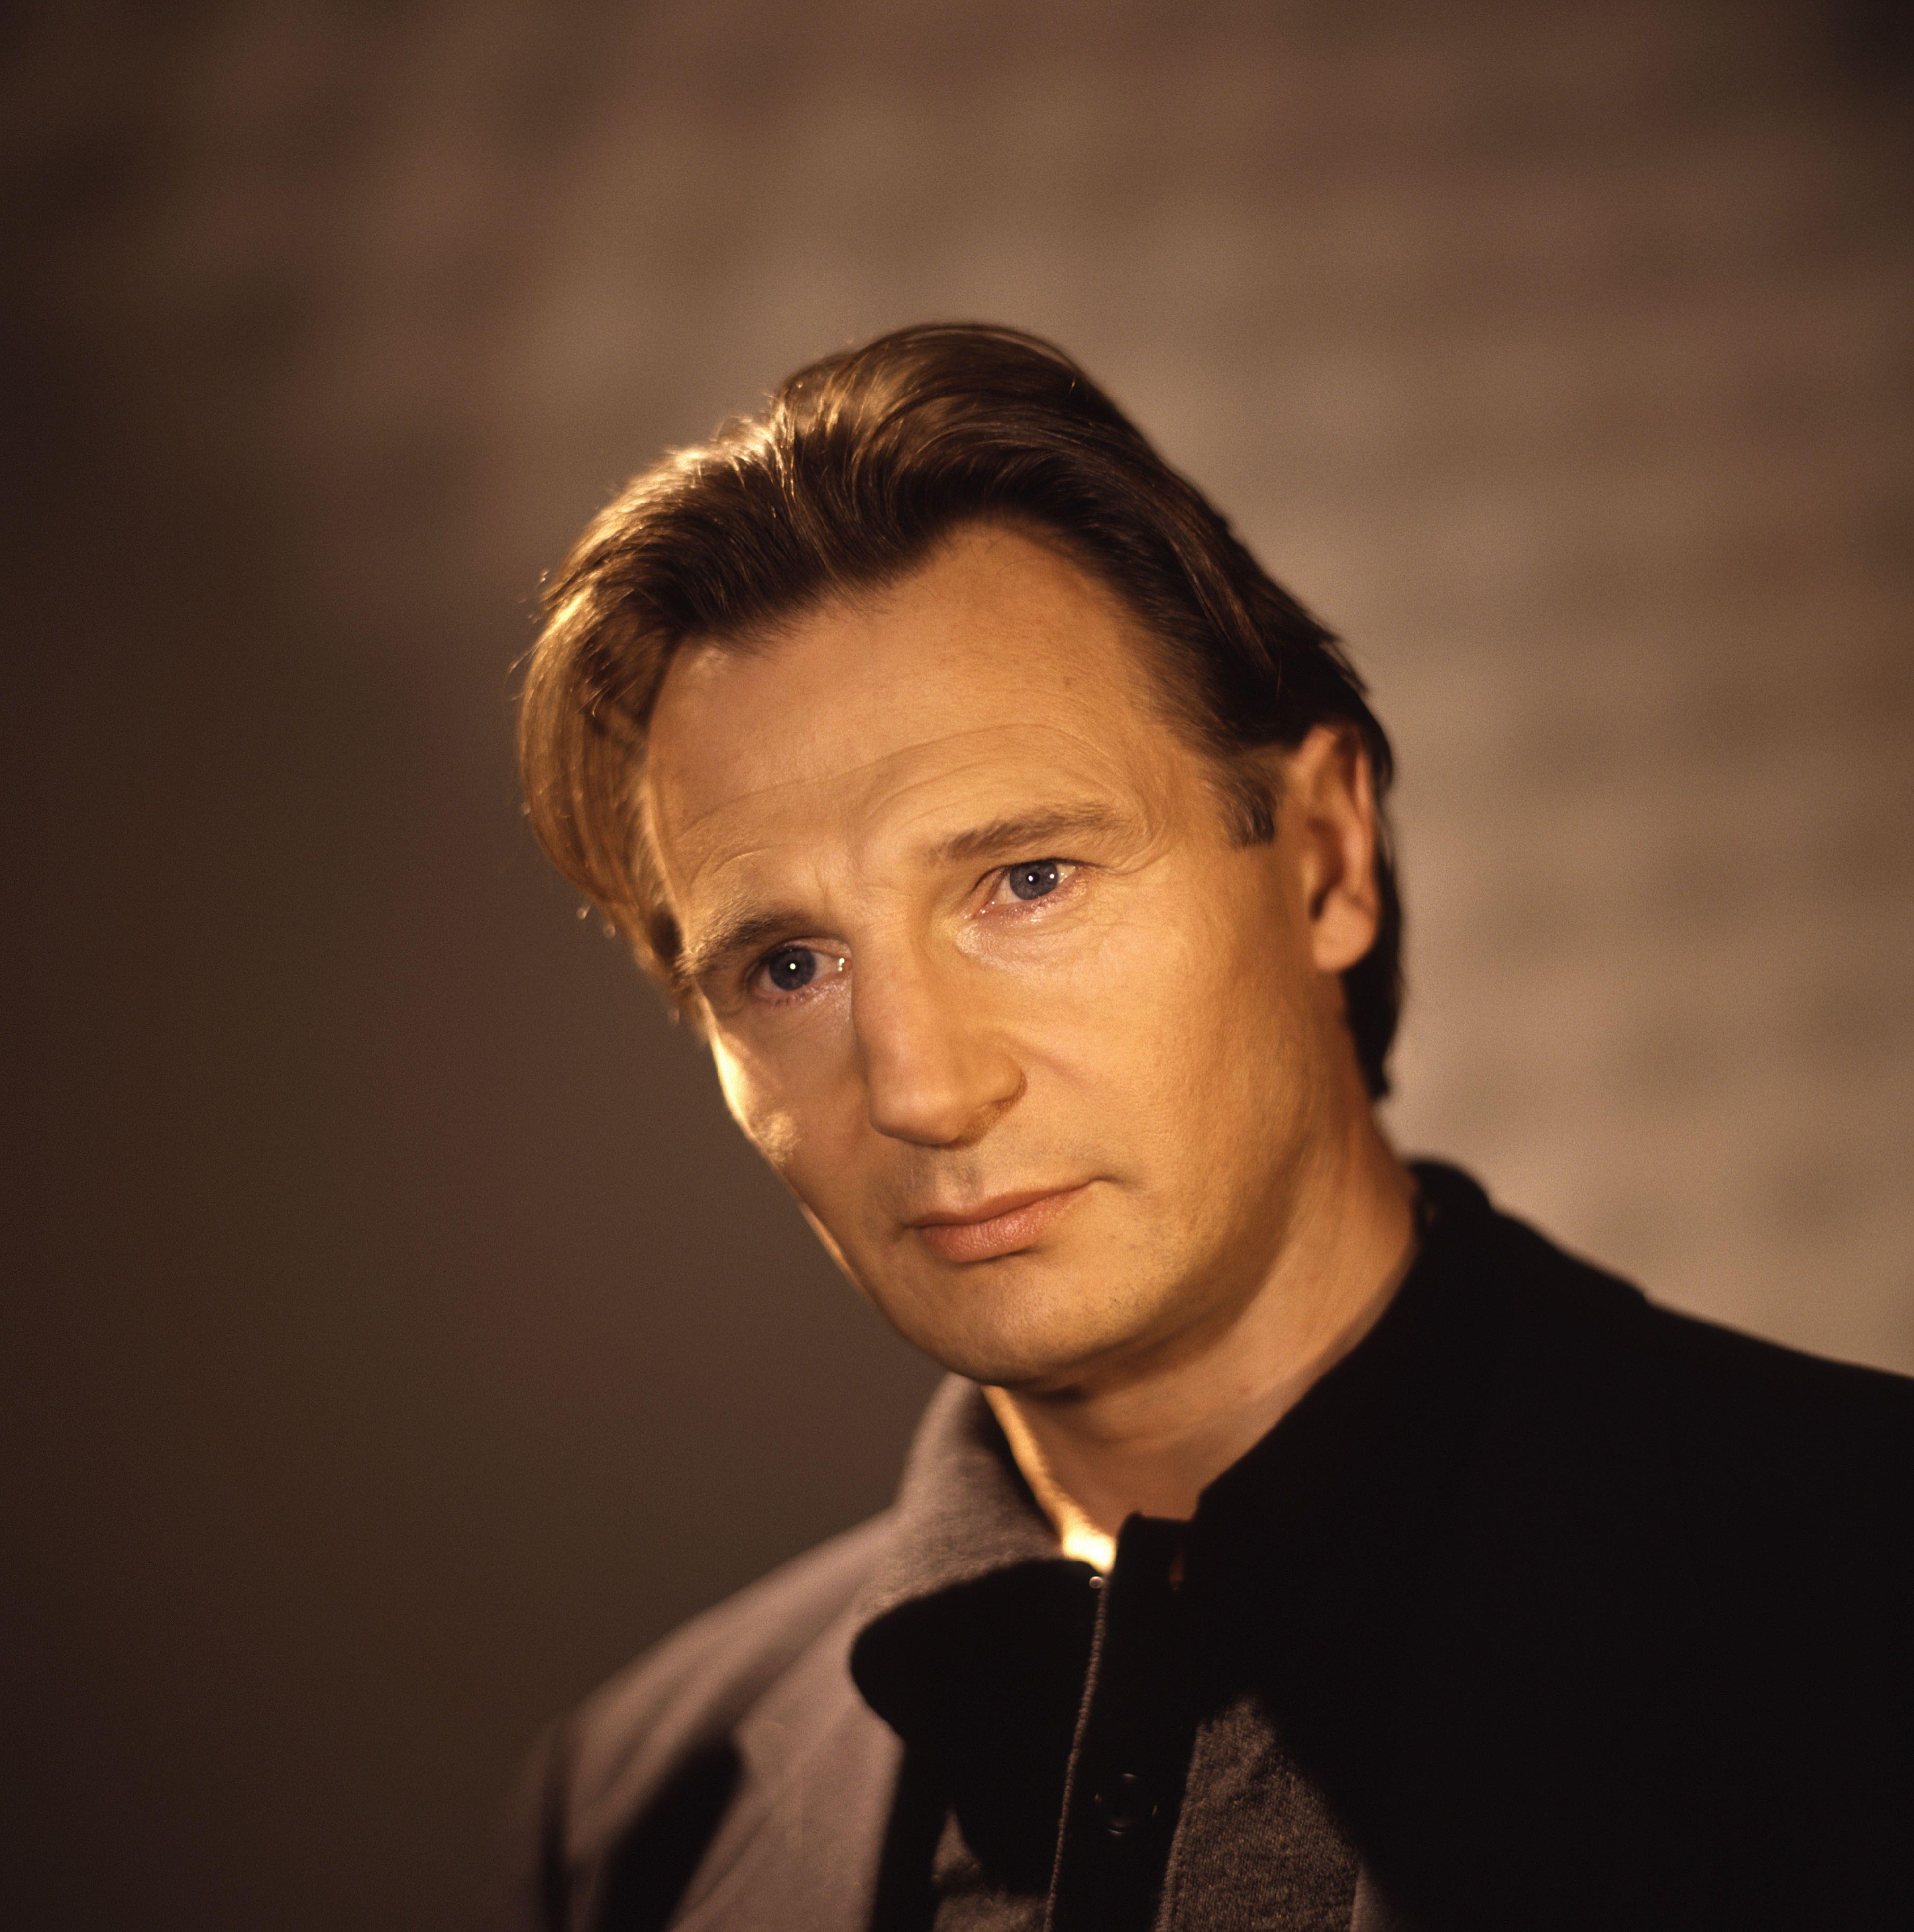 Liam Neeson photo 52 of 78 pics, wallpaper - photo #378023 ... Liam Neeson